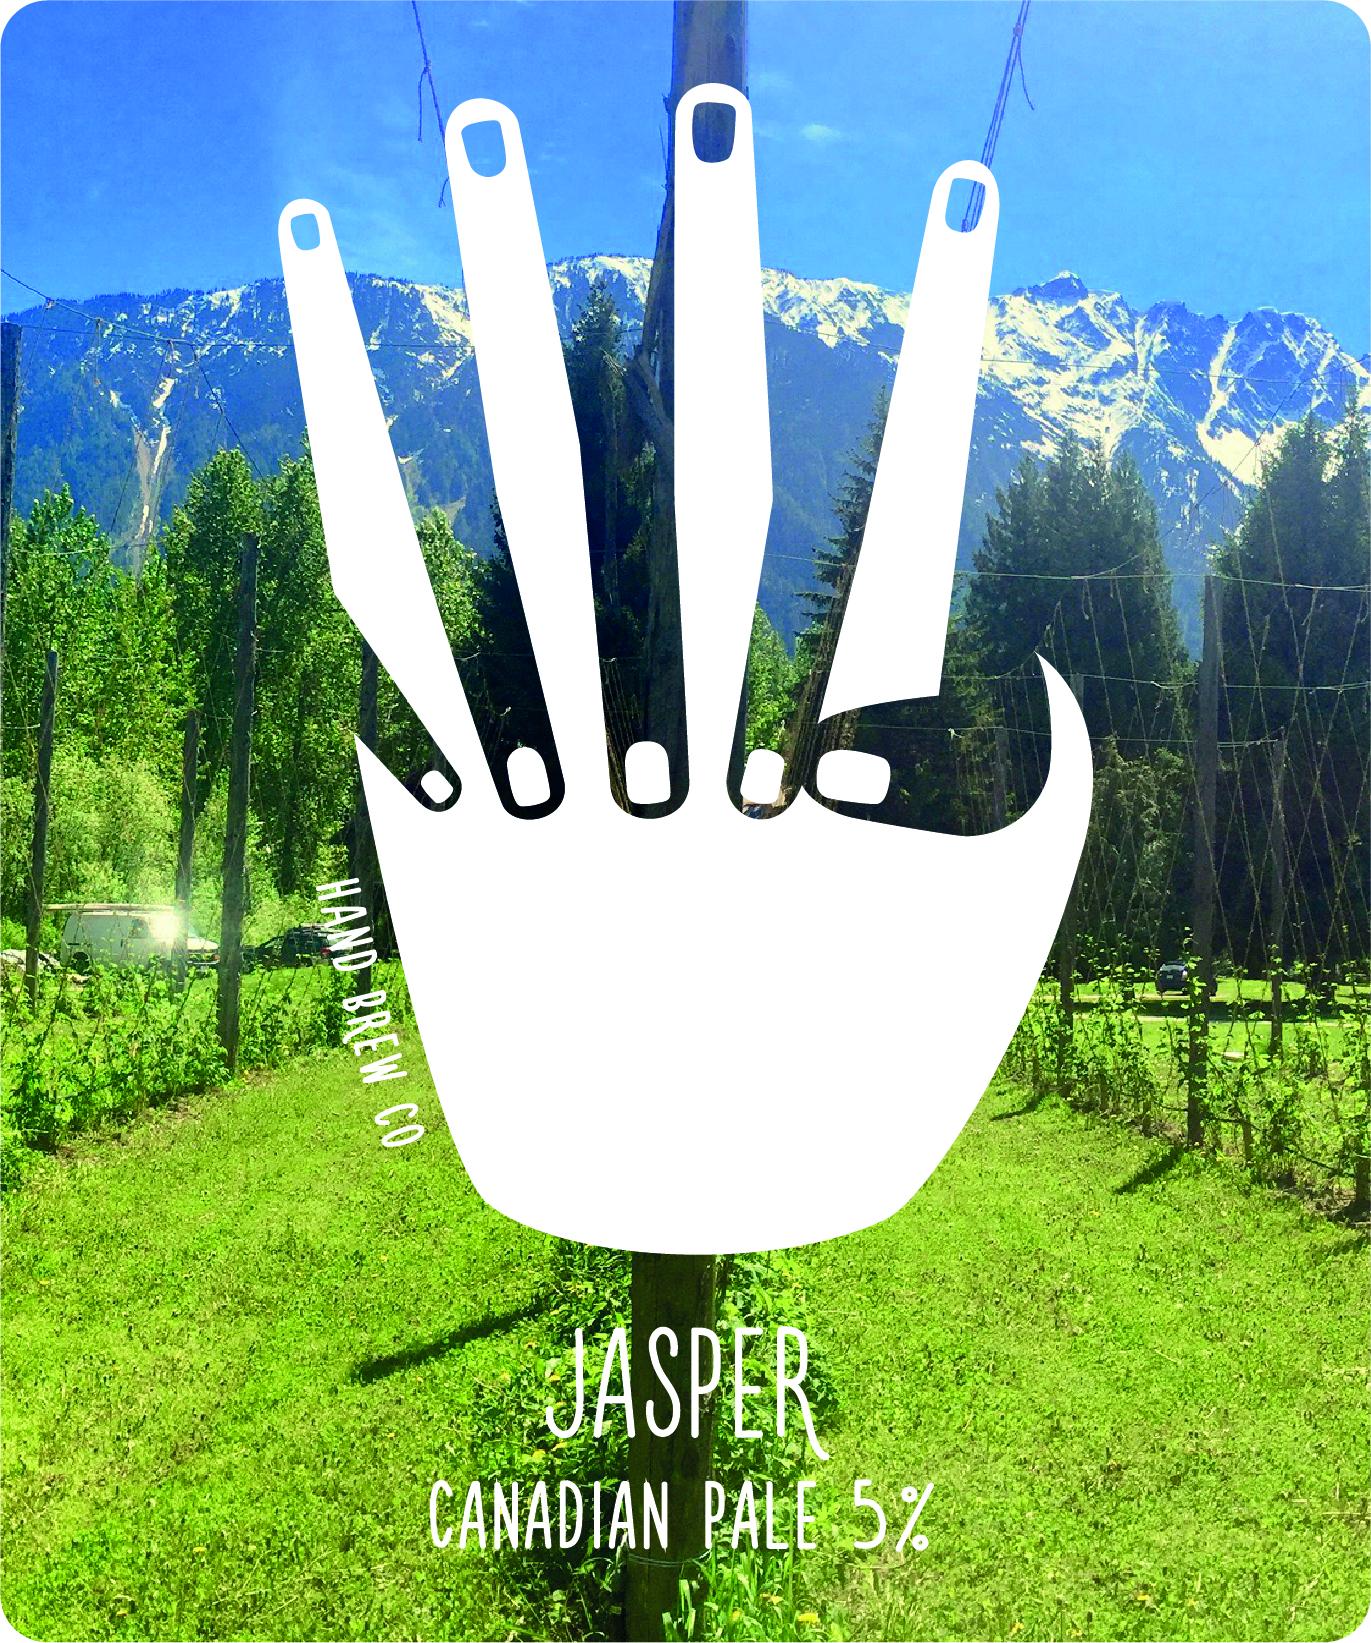 HandBrewCo_PumpClip_Jasper_CanadianPale_Final_OL.jpg